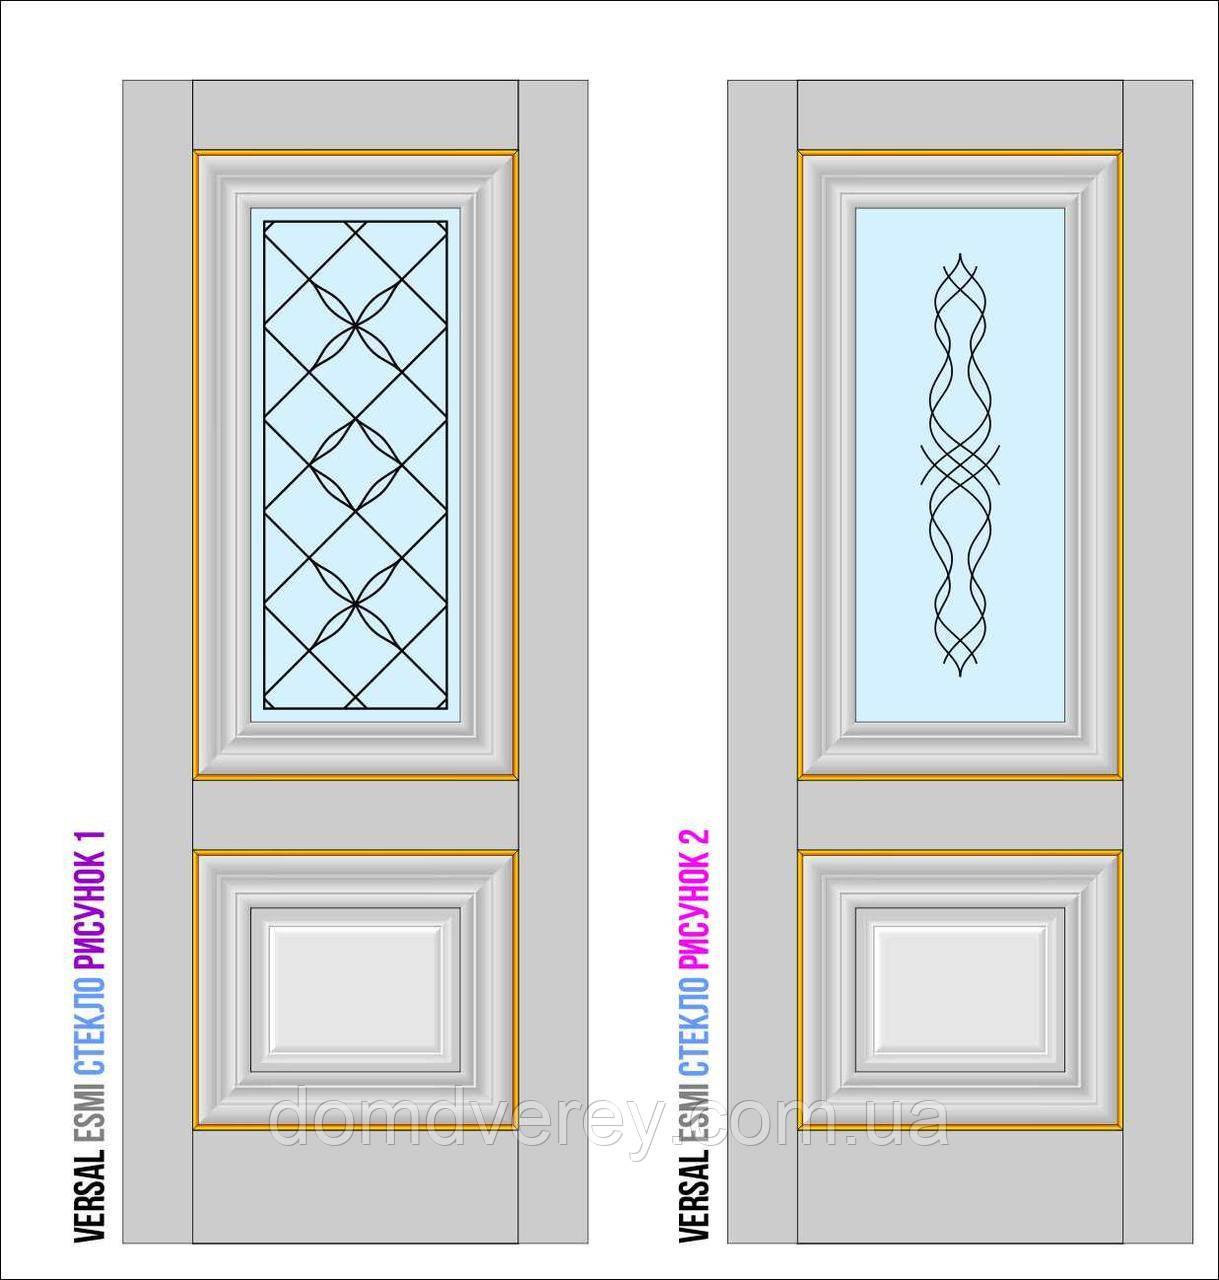 Двери межкомнатные, Родос, Versal, Esmi, со стеклом и рисунком, small molding